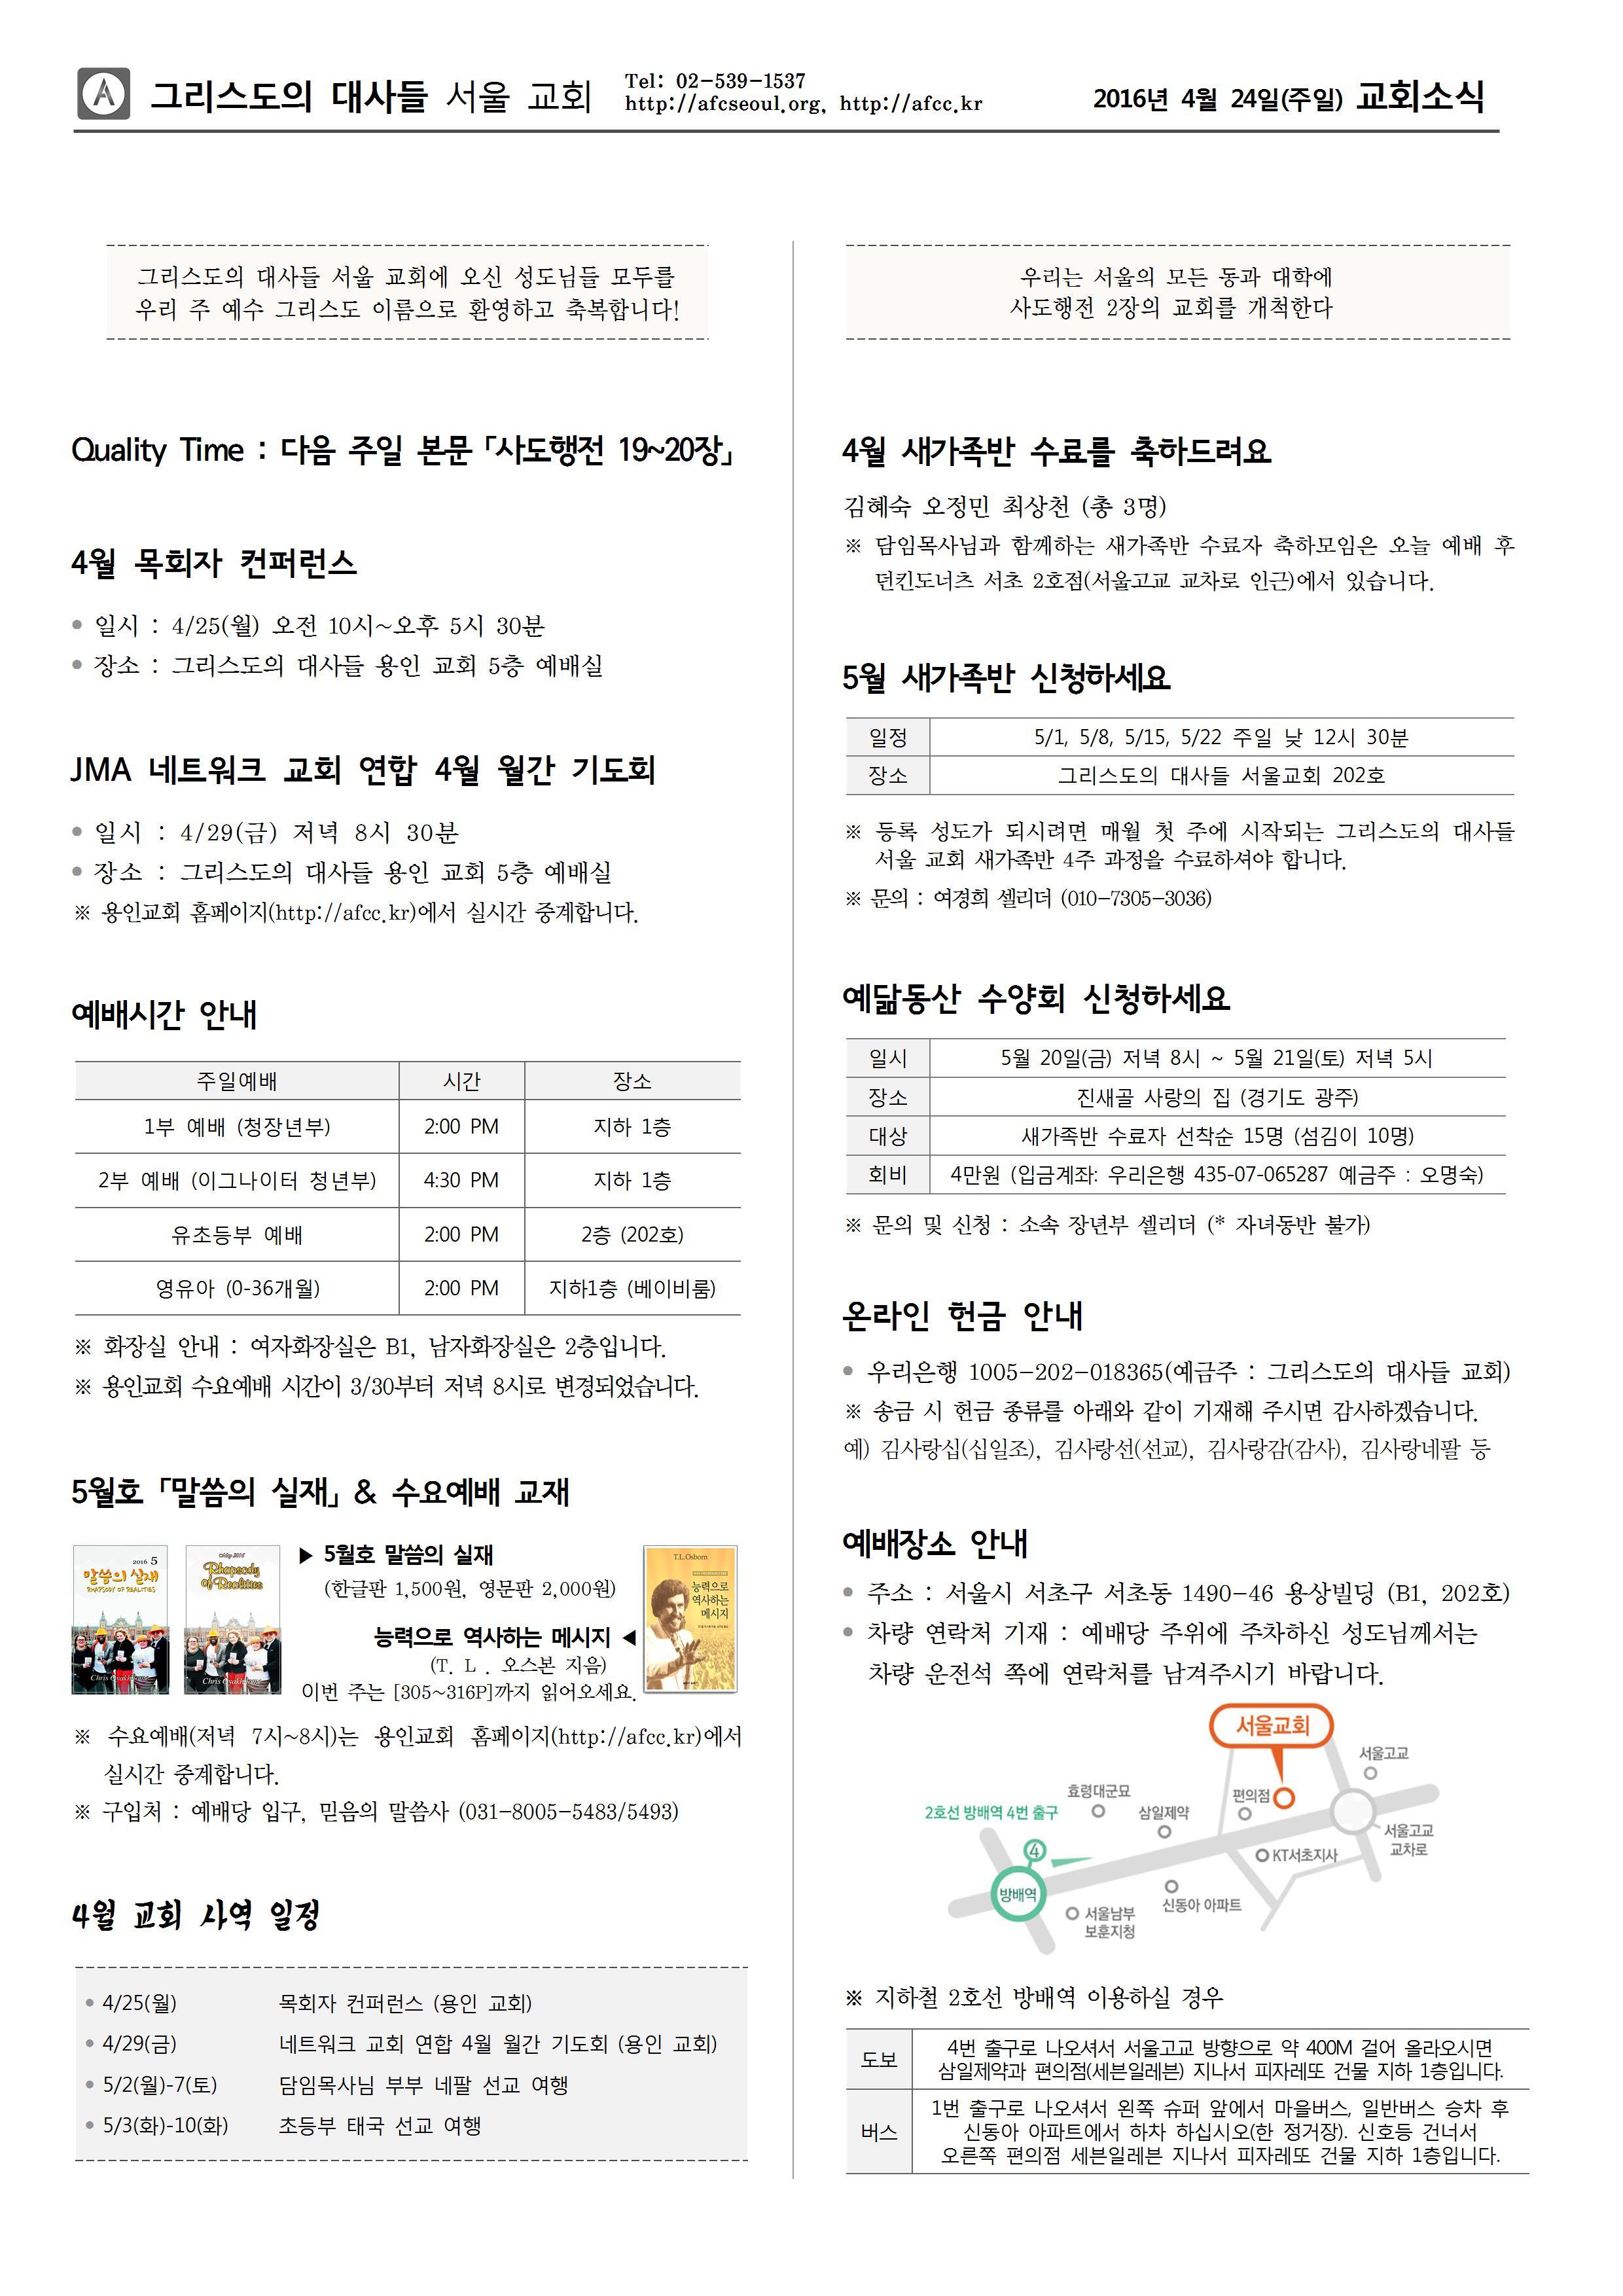 seoul_image001